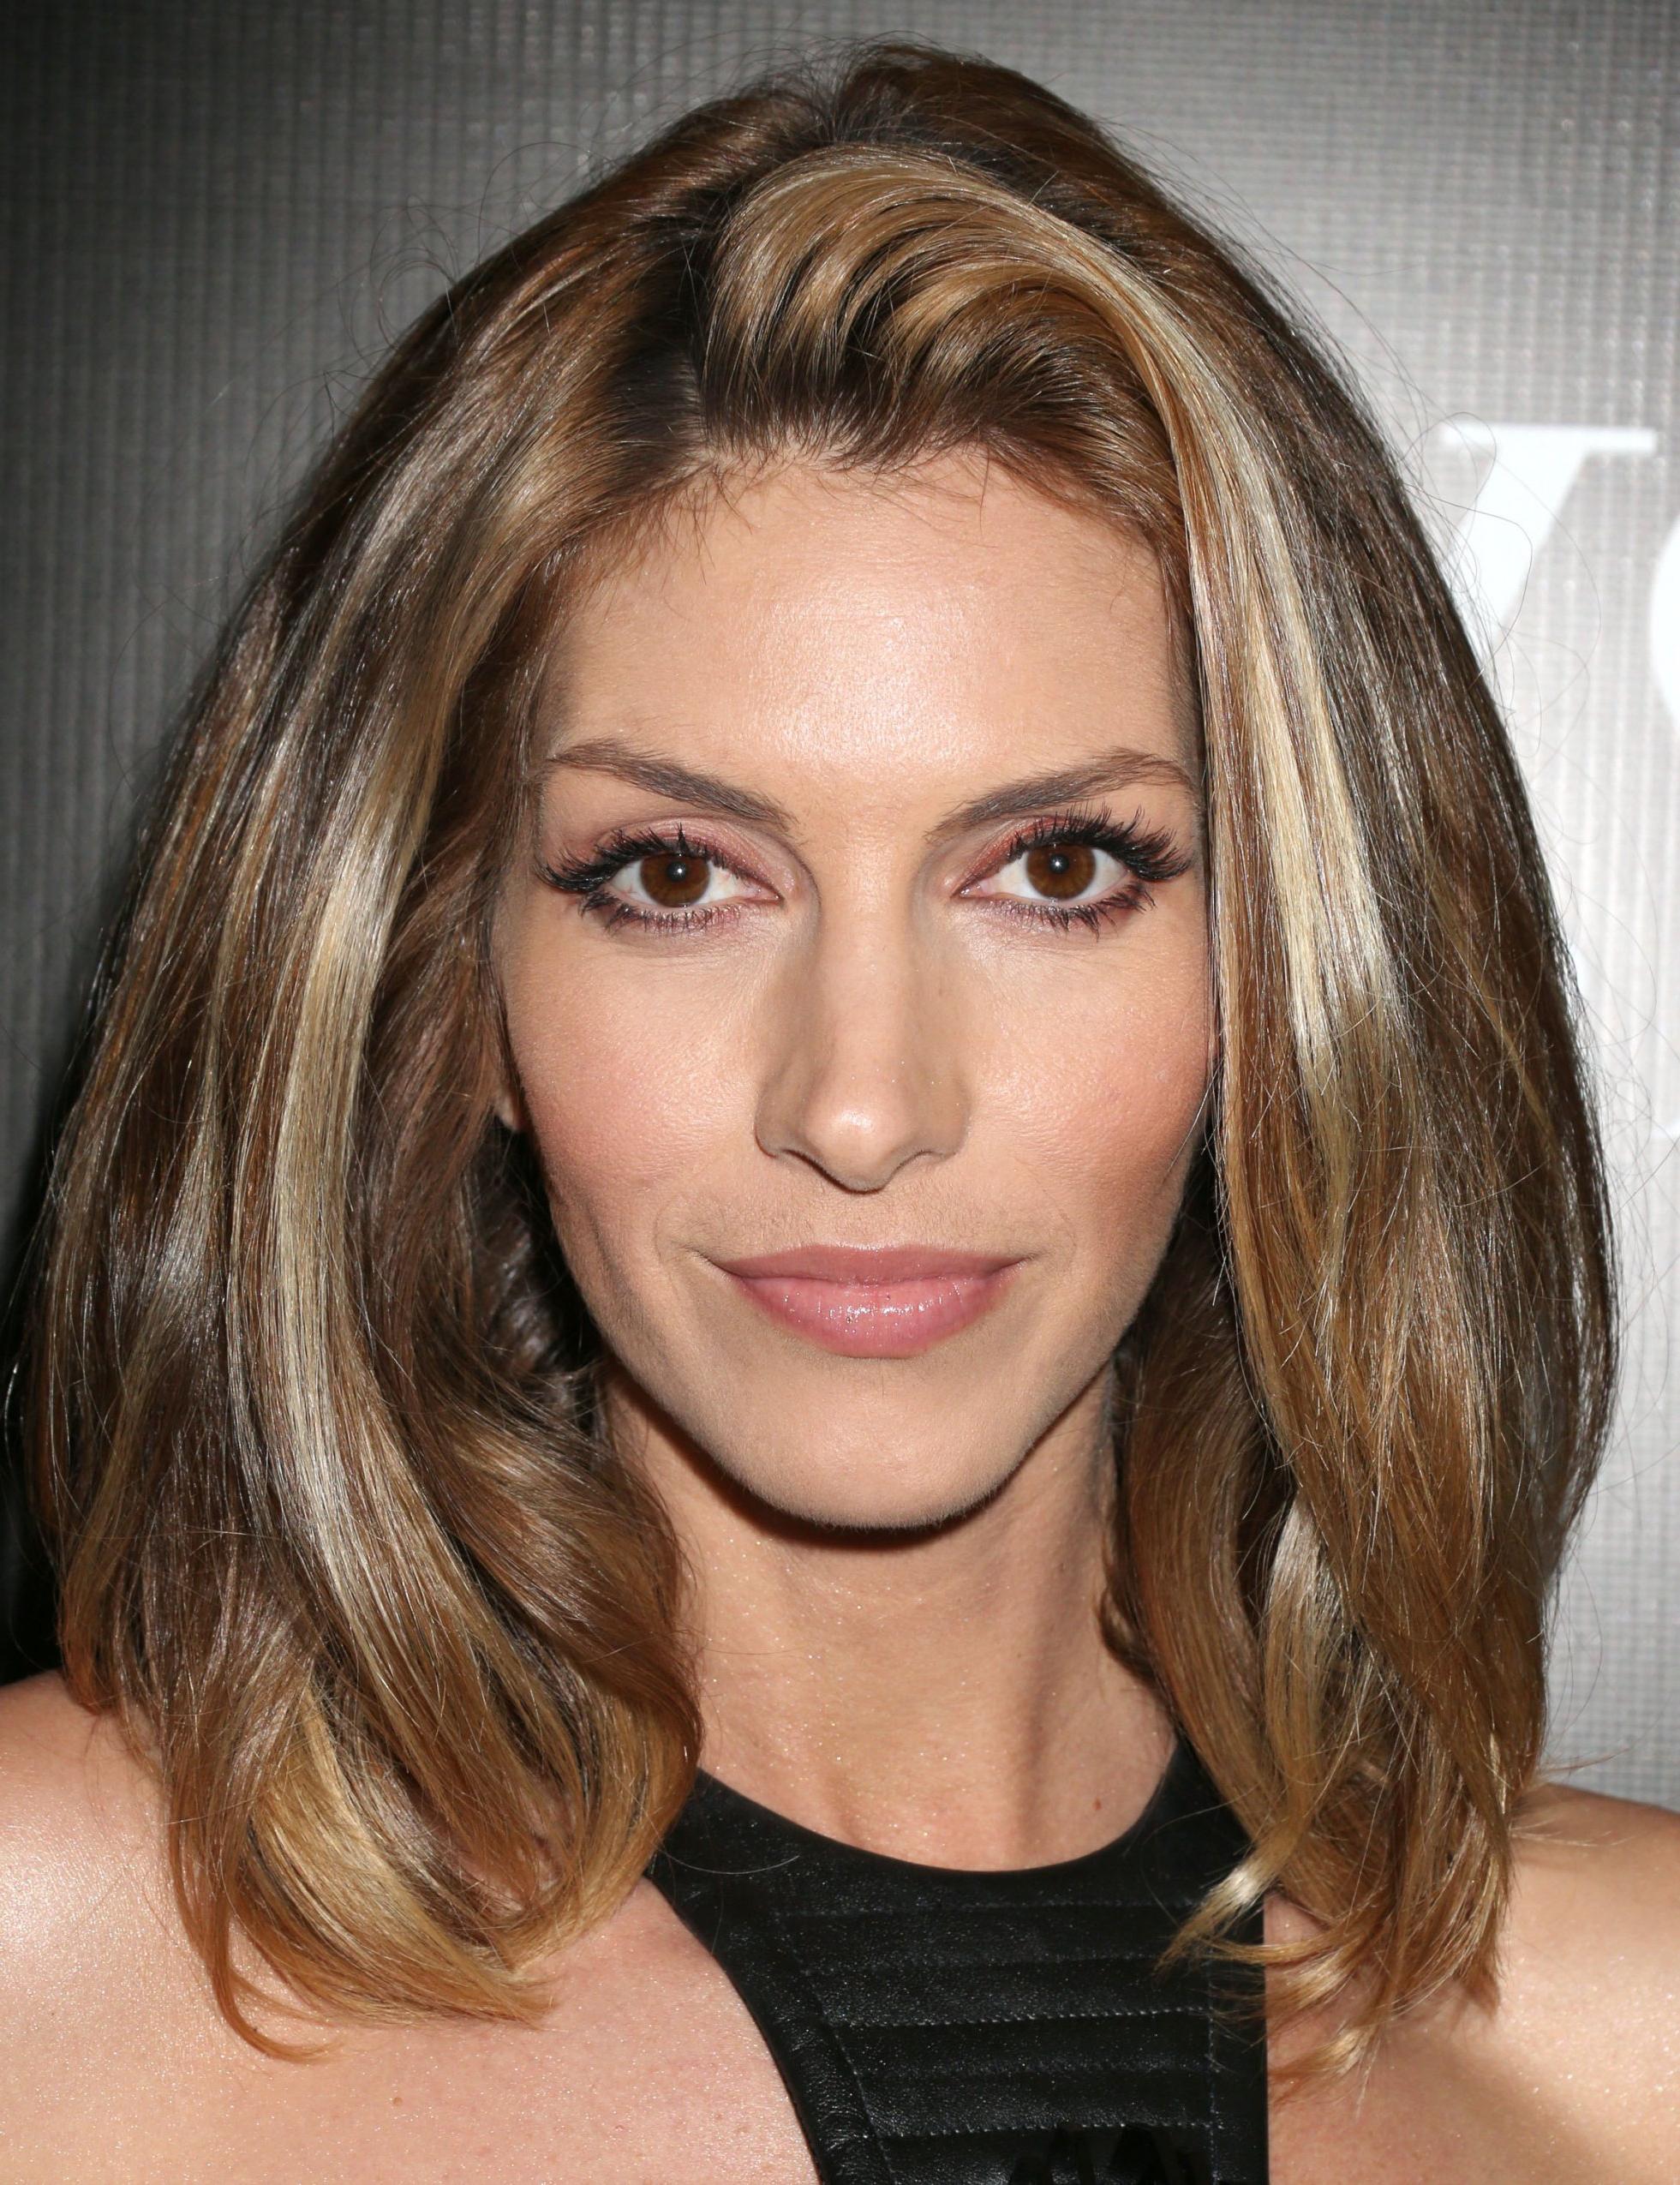 Medium Hairstyle : Cute Medium Length Haircuts For Round Faces Best Regarding Most Recent Medium Haircuts For Wavy Hair And Round Faces (View 9 of 20)